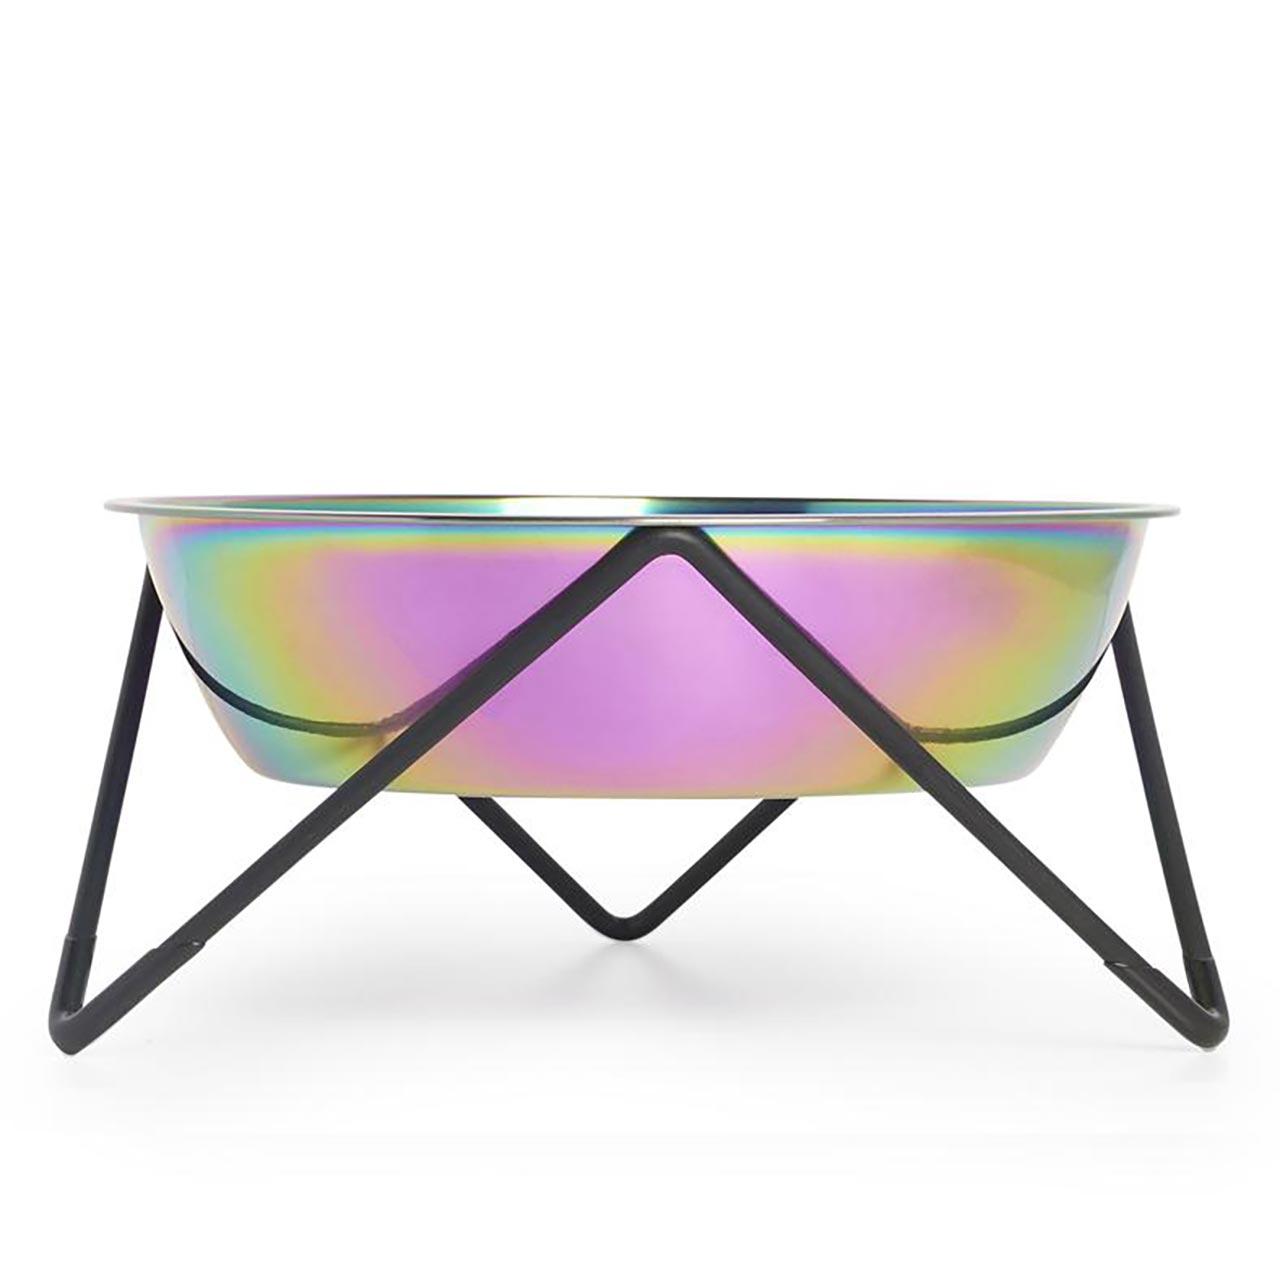 BENDO Dog Bowl Woof Iridescent on Black | the design gift shop